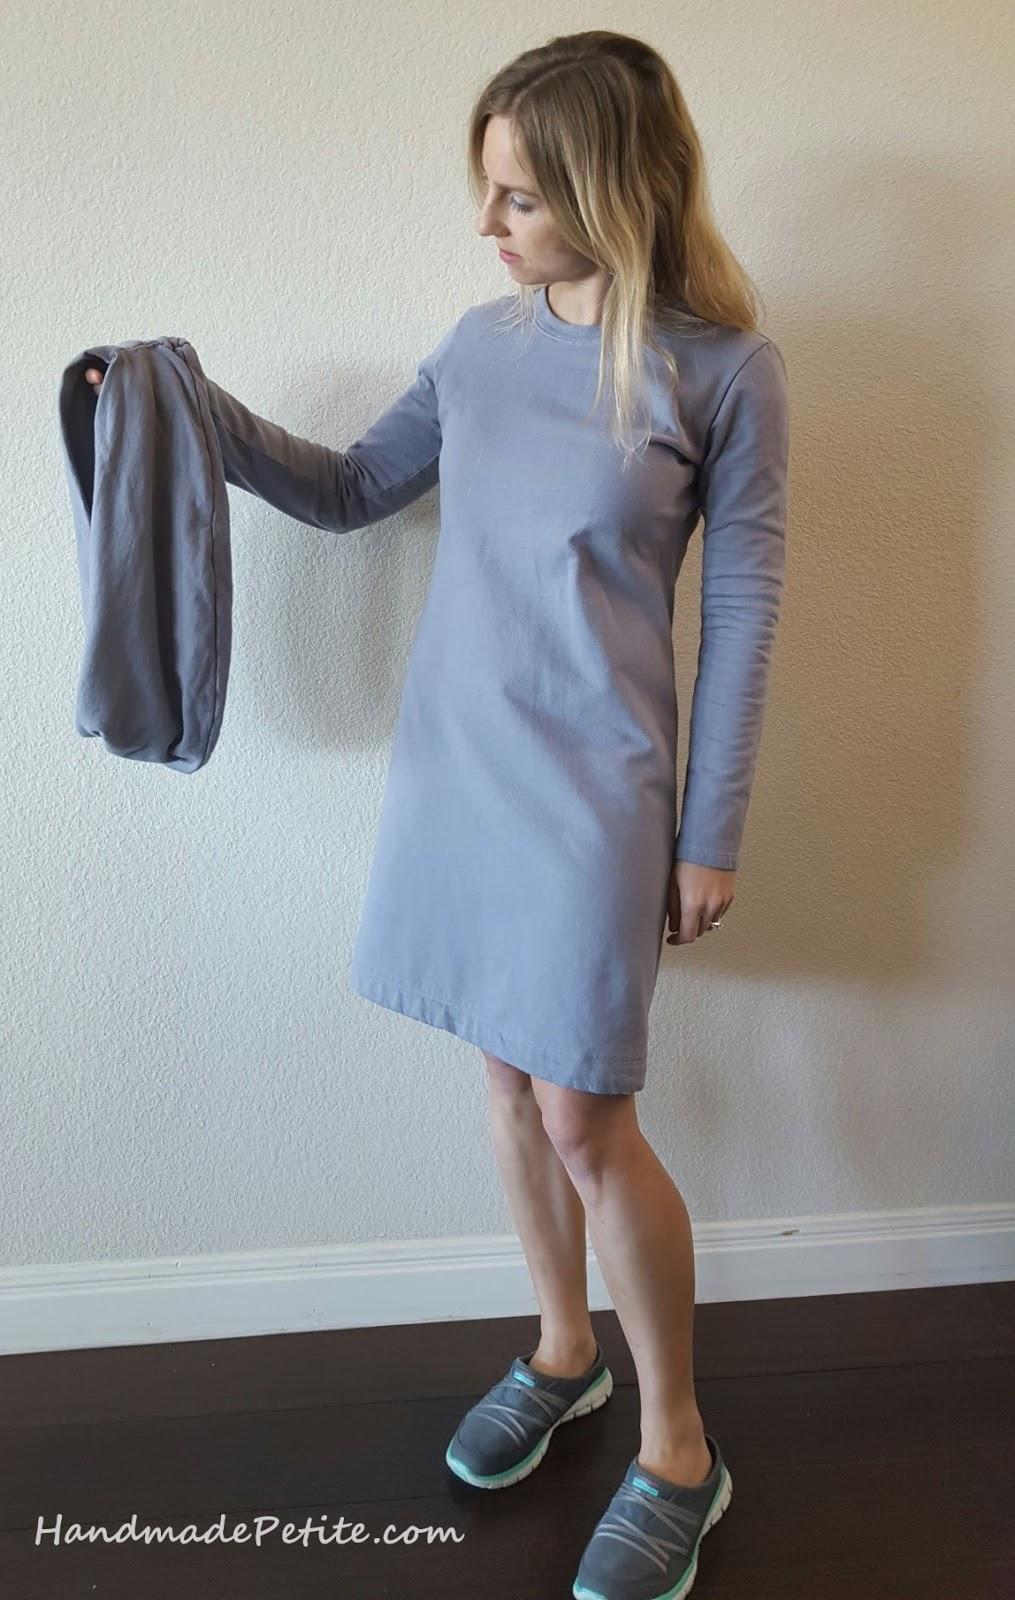 Handmade sweatshirt removable cowl using Simplicity 2054 sewing pattern